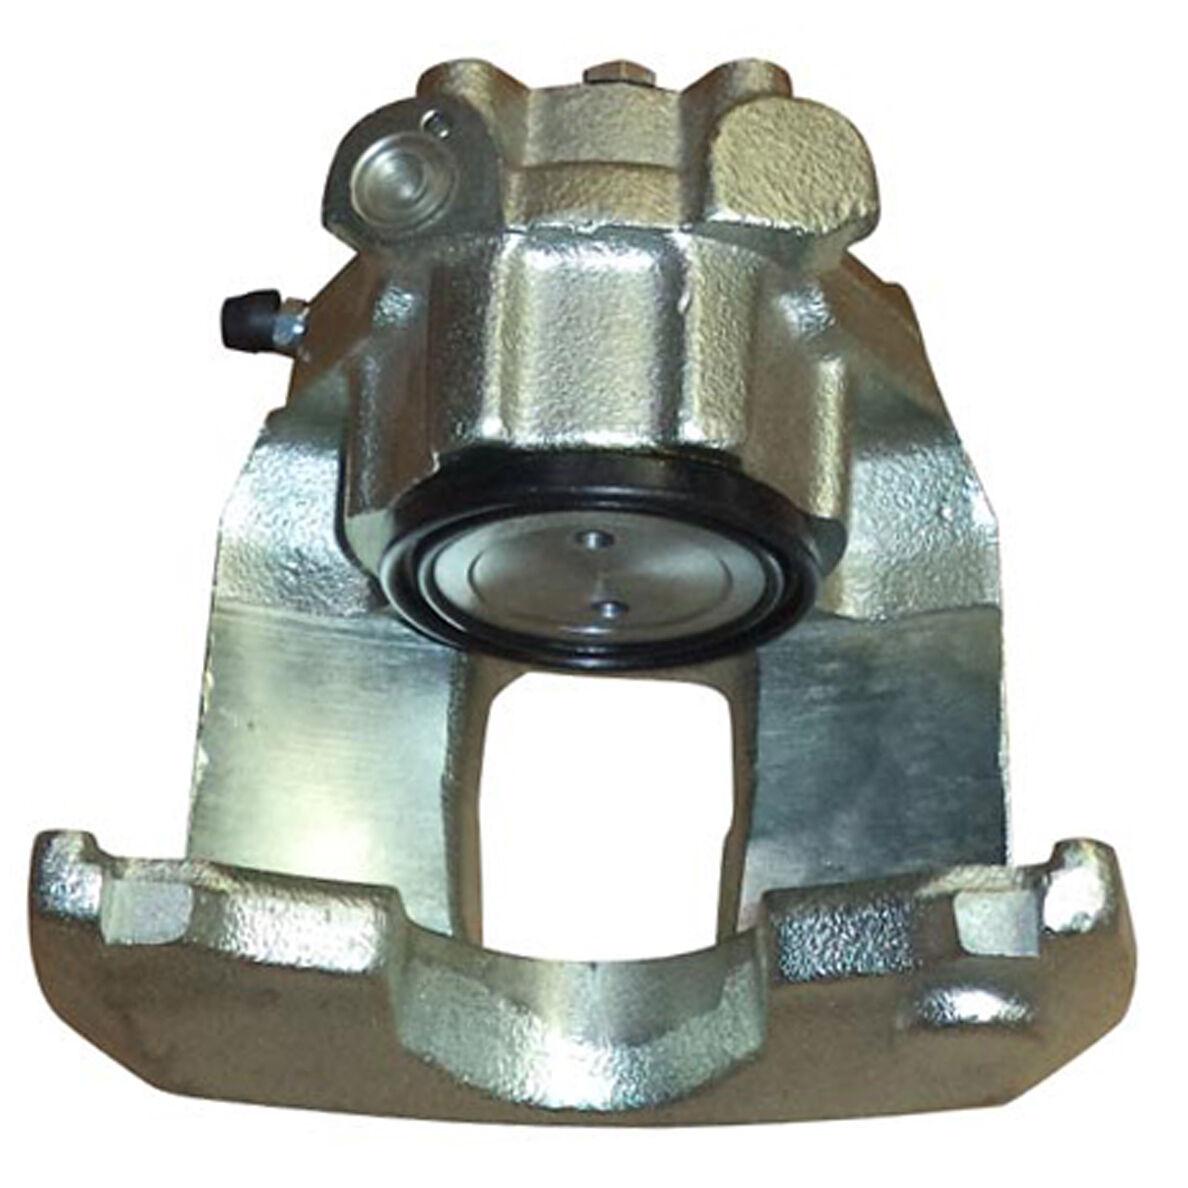 new rear pair disc brake caliper for ford granada 77 80. Black Bedroom Furniture Sets. Home Design Ideas